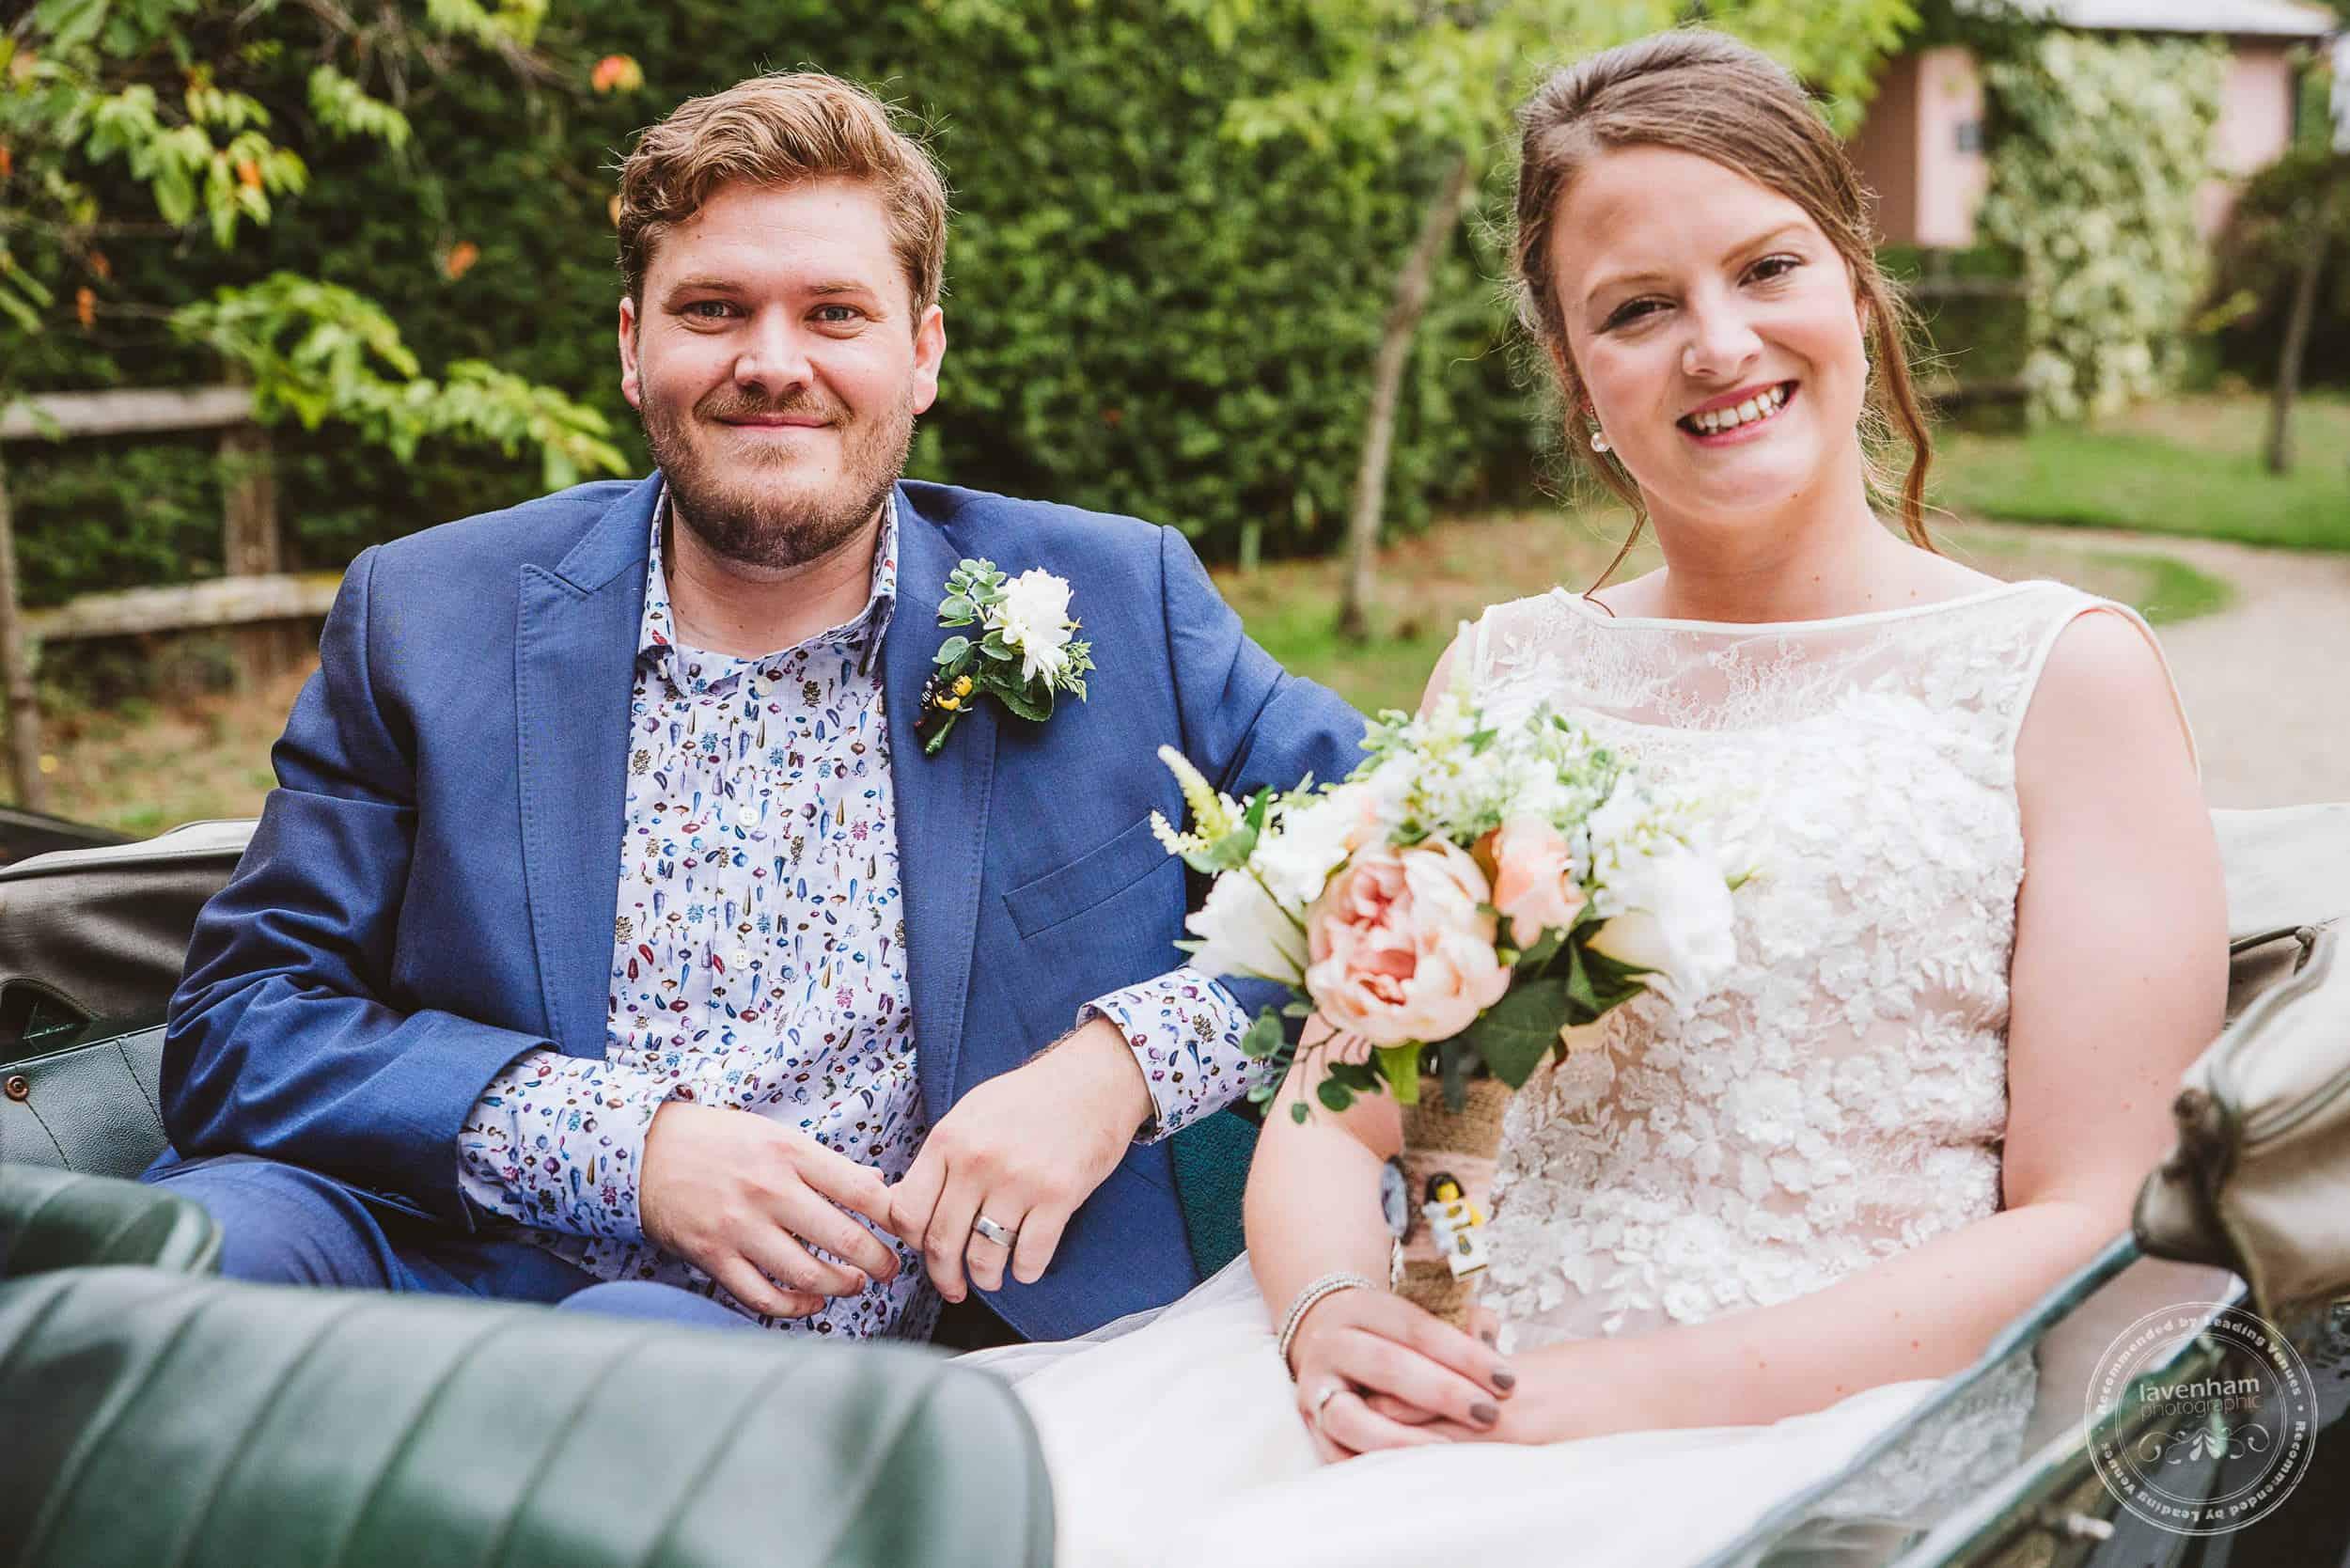 180818 Marks Hall Wedding Photography Lavenham Photographic 074